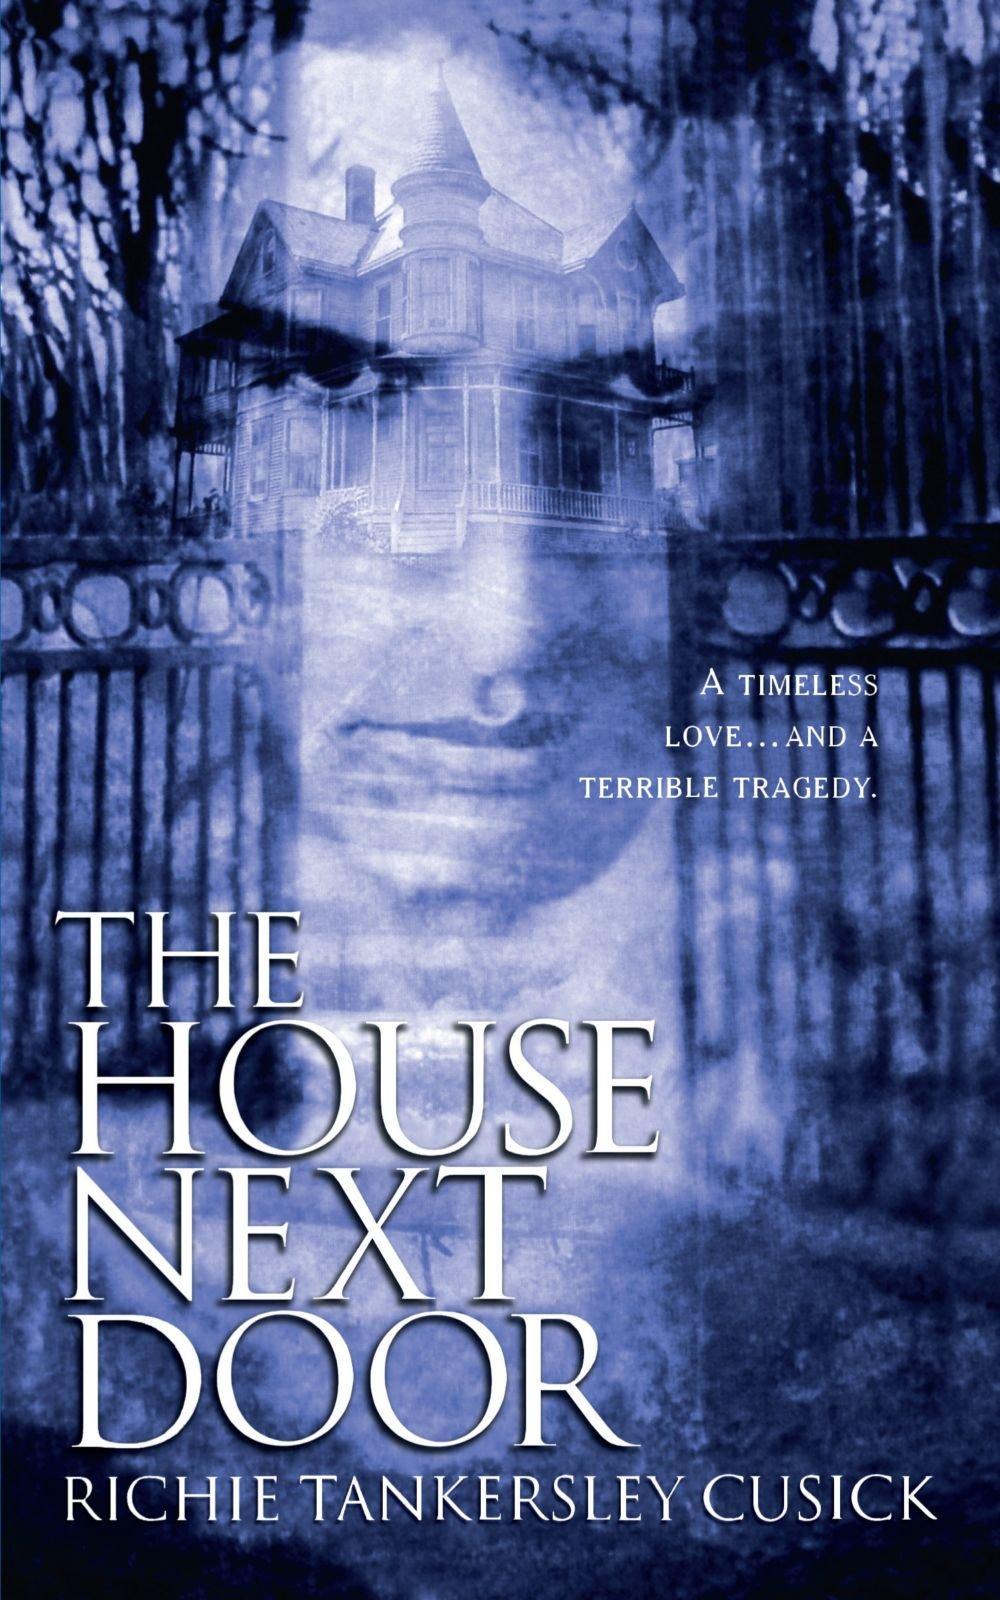 Good The House Next Door: Richie Tankersley Cusick: 9780743418386: Amazon.com:  Books